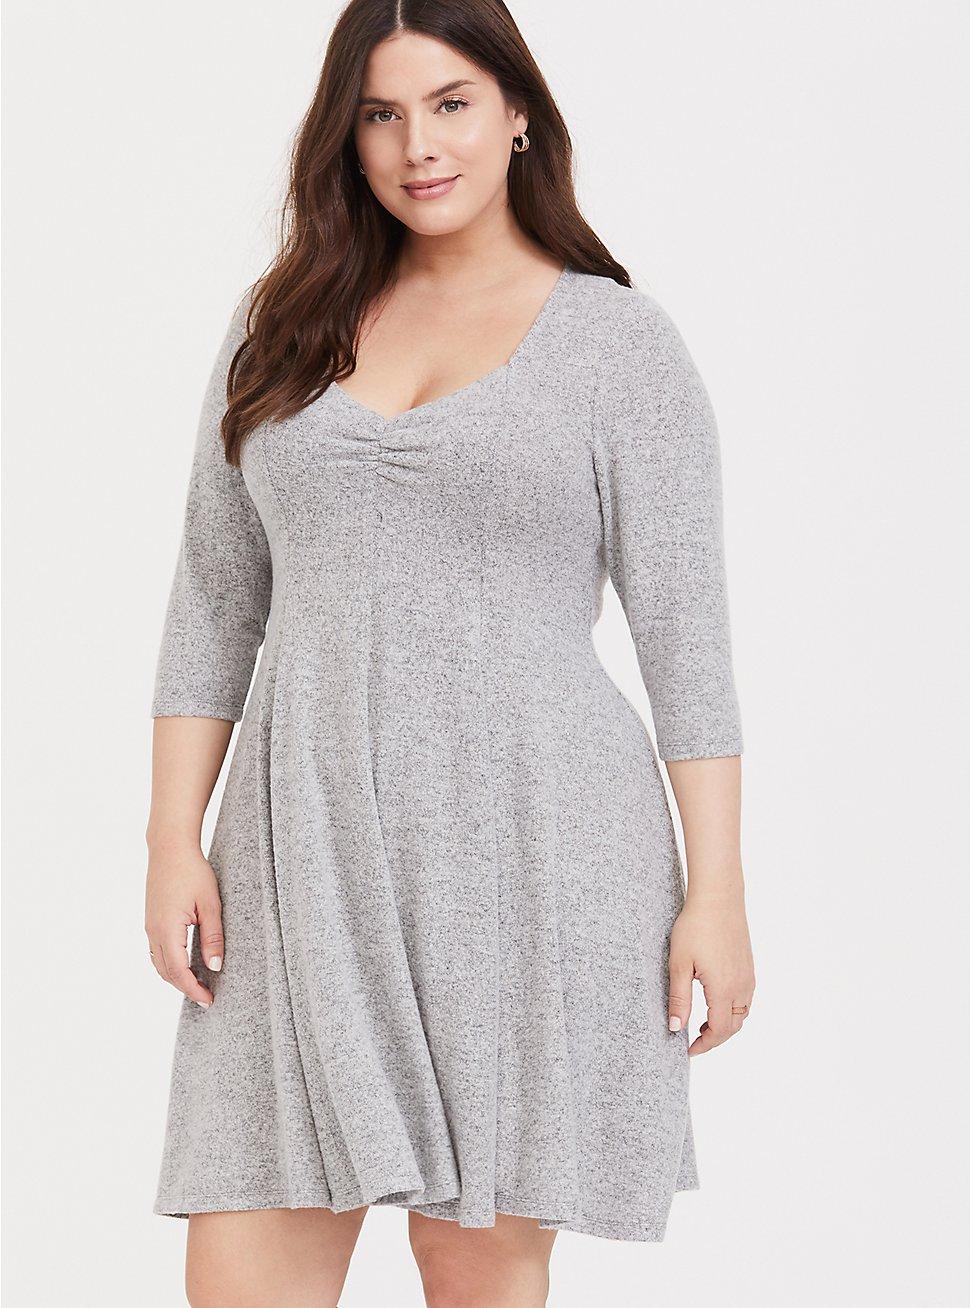 Super Soft Plush Light Grey Sweetheart Fluted Dress, , fitModel1-hires